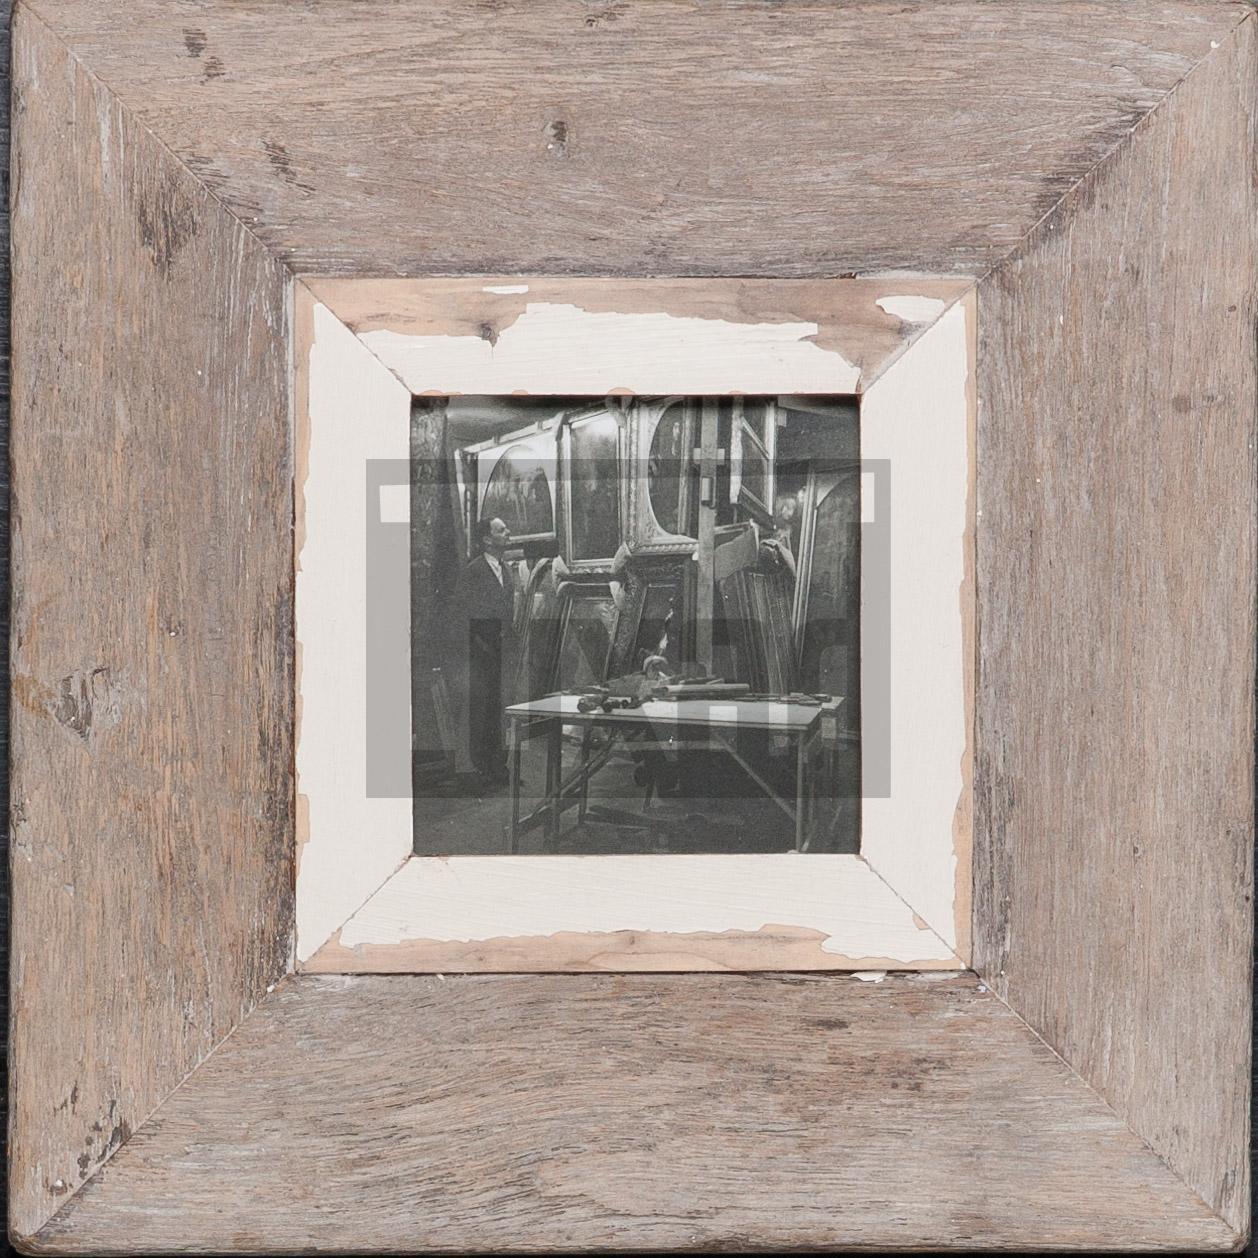 Quadratischer Bilderrahmen für ca. 10,5 x 10,5 cm